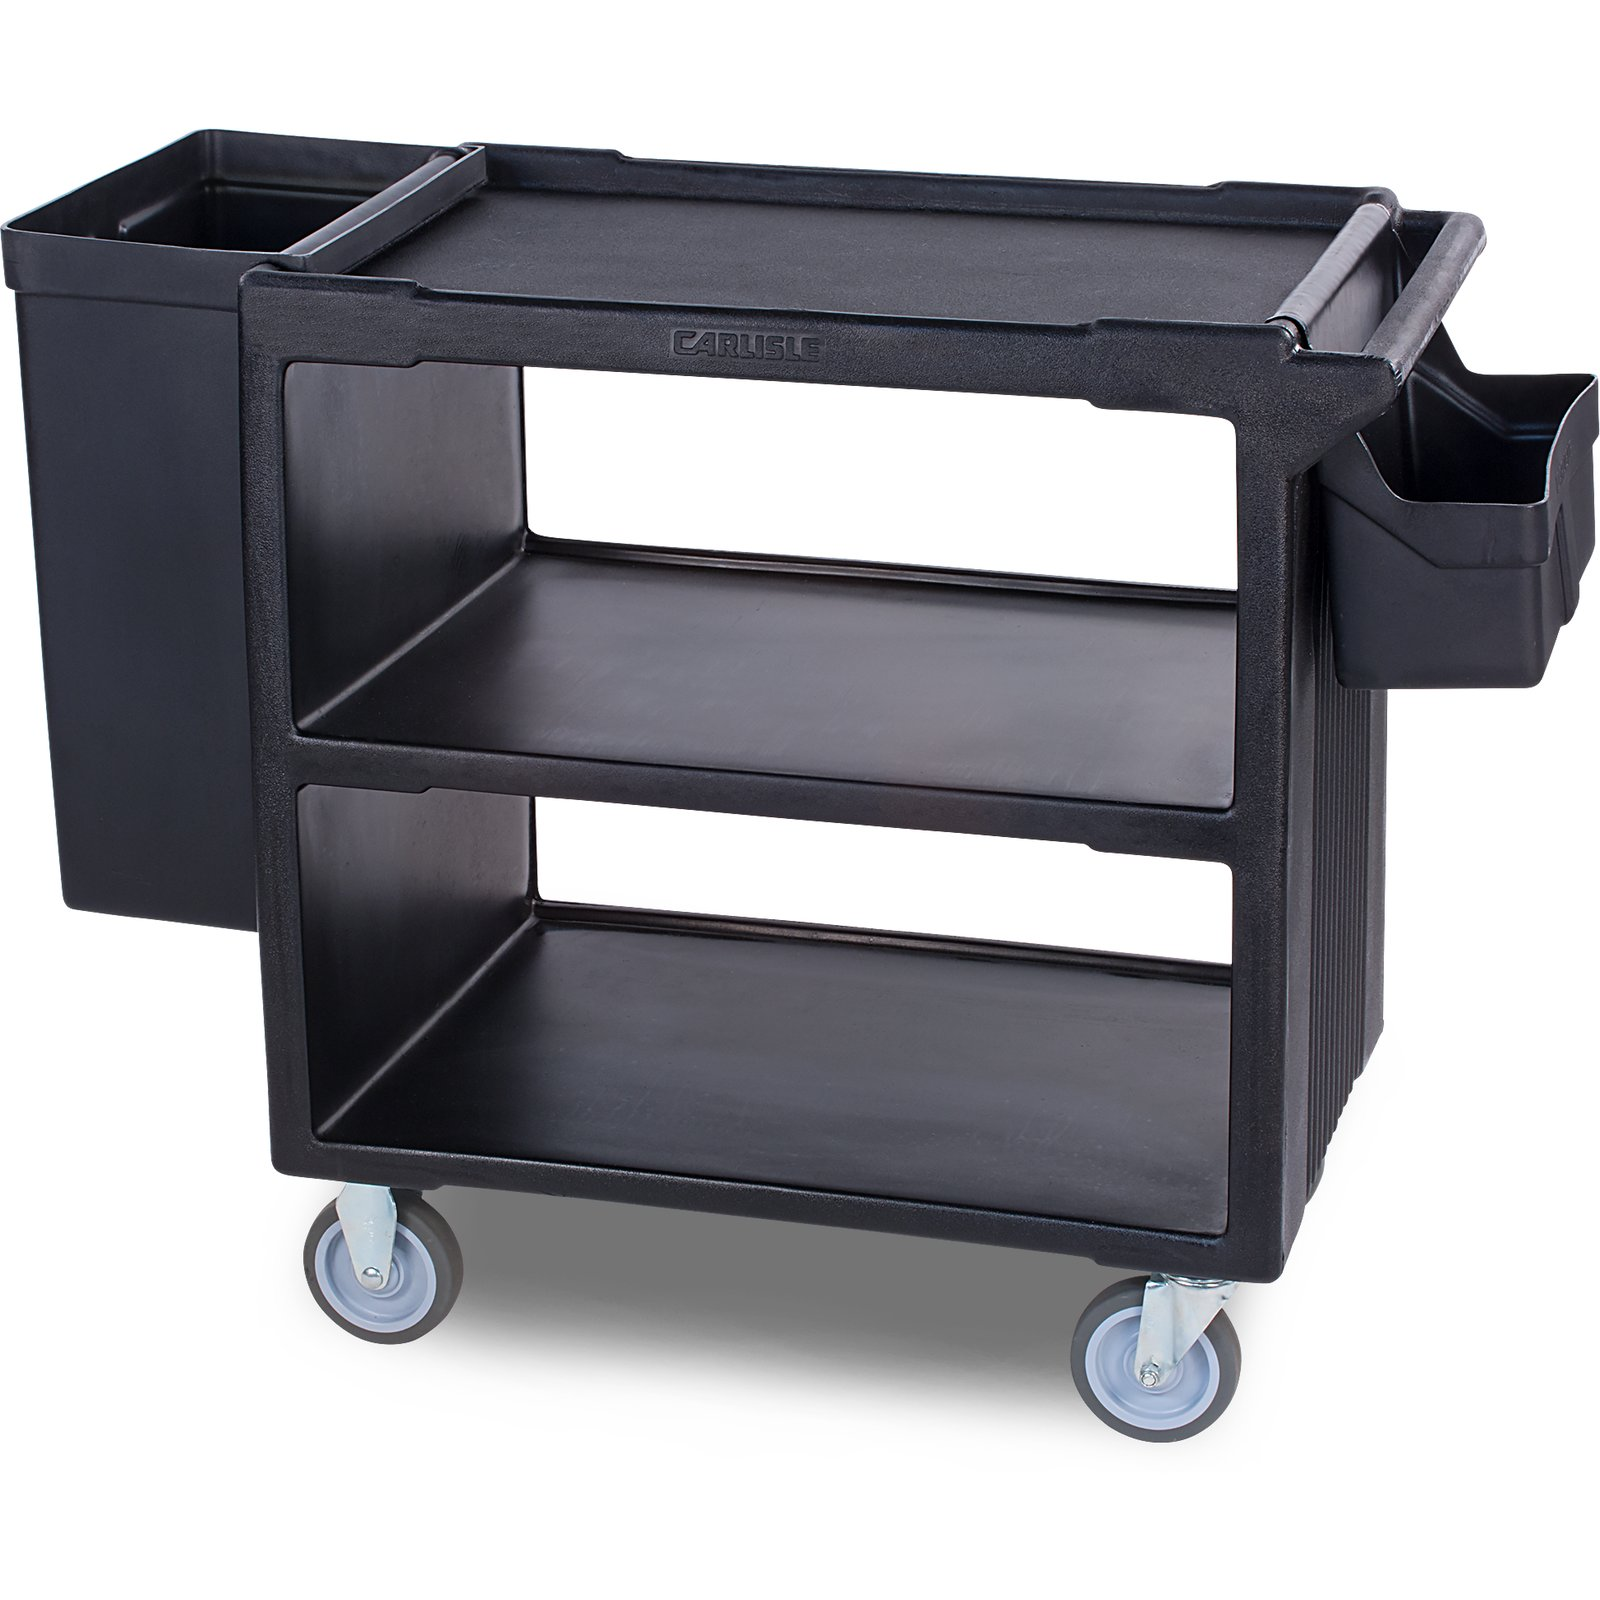 sbc11sh03 silverware holder for service cart sbc230 black - Silverware Holder